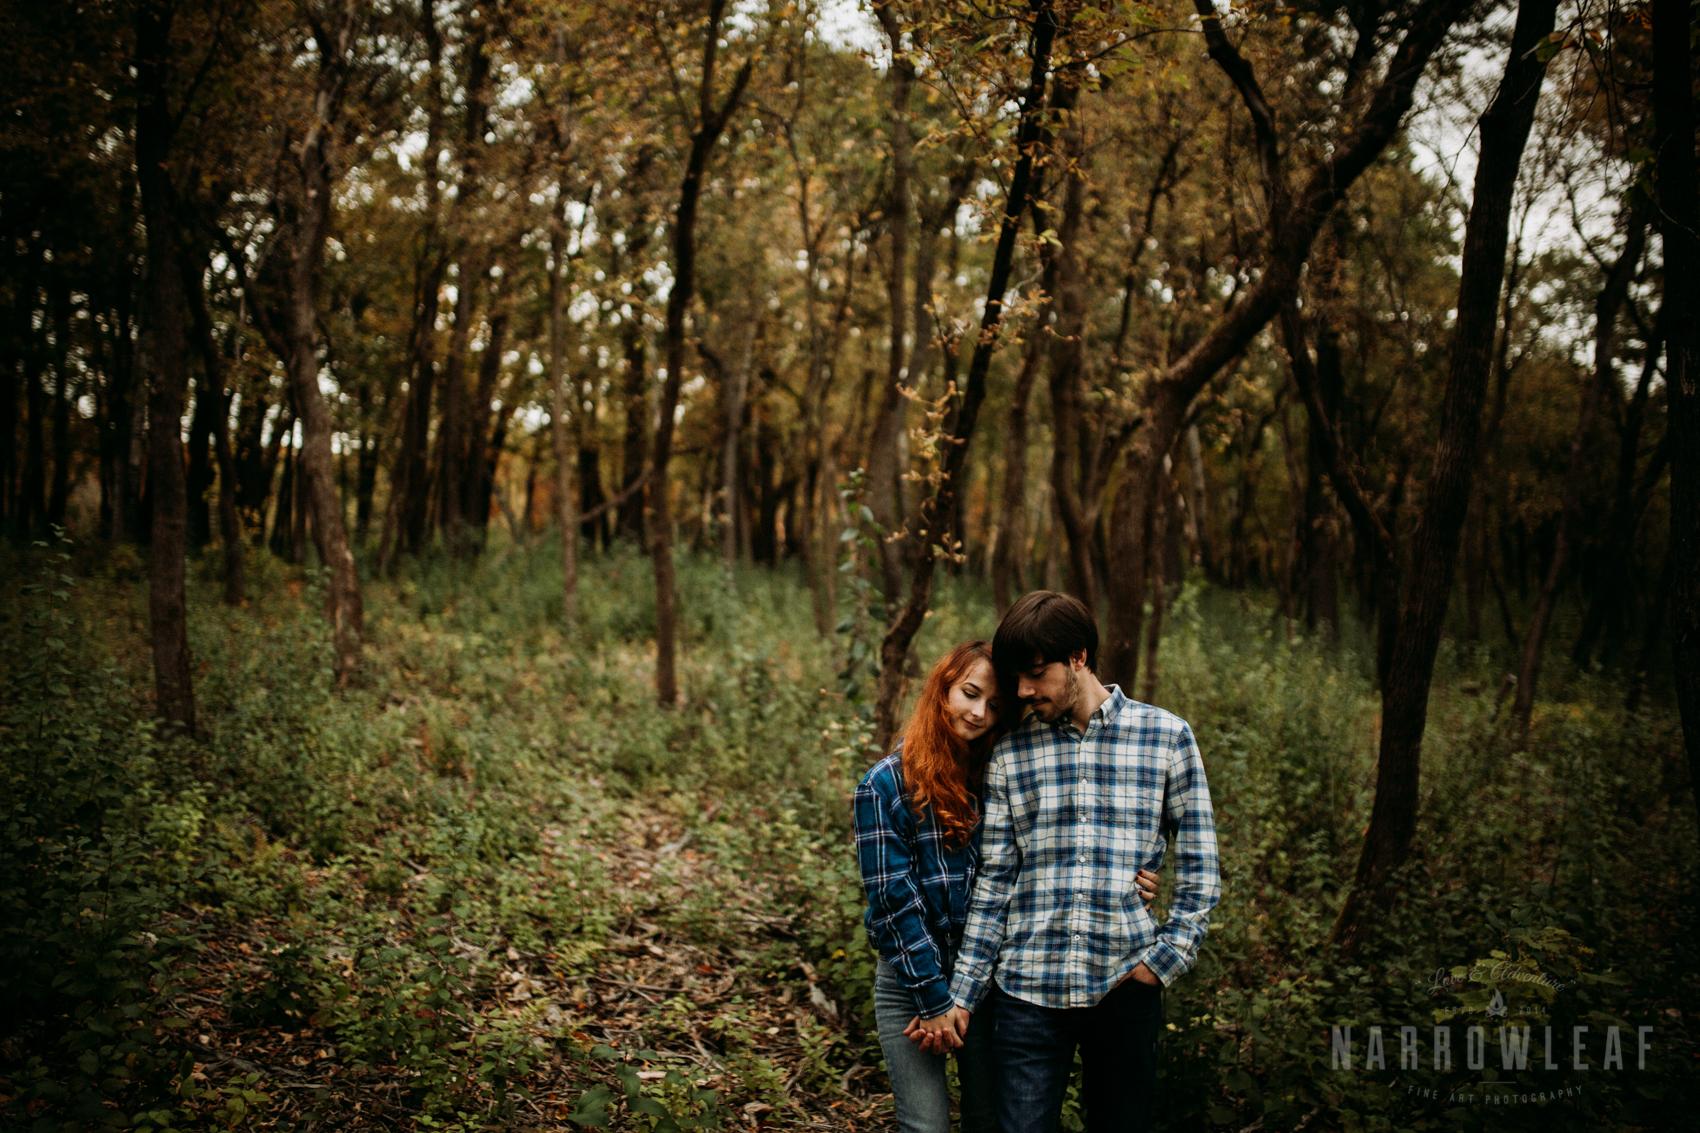 fall-engagement-lebanon-hills-mn-NarrowLeaf_Adventure_Photography-32.jpg